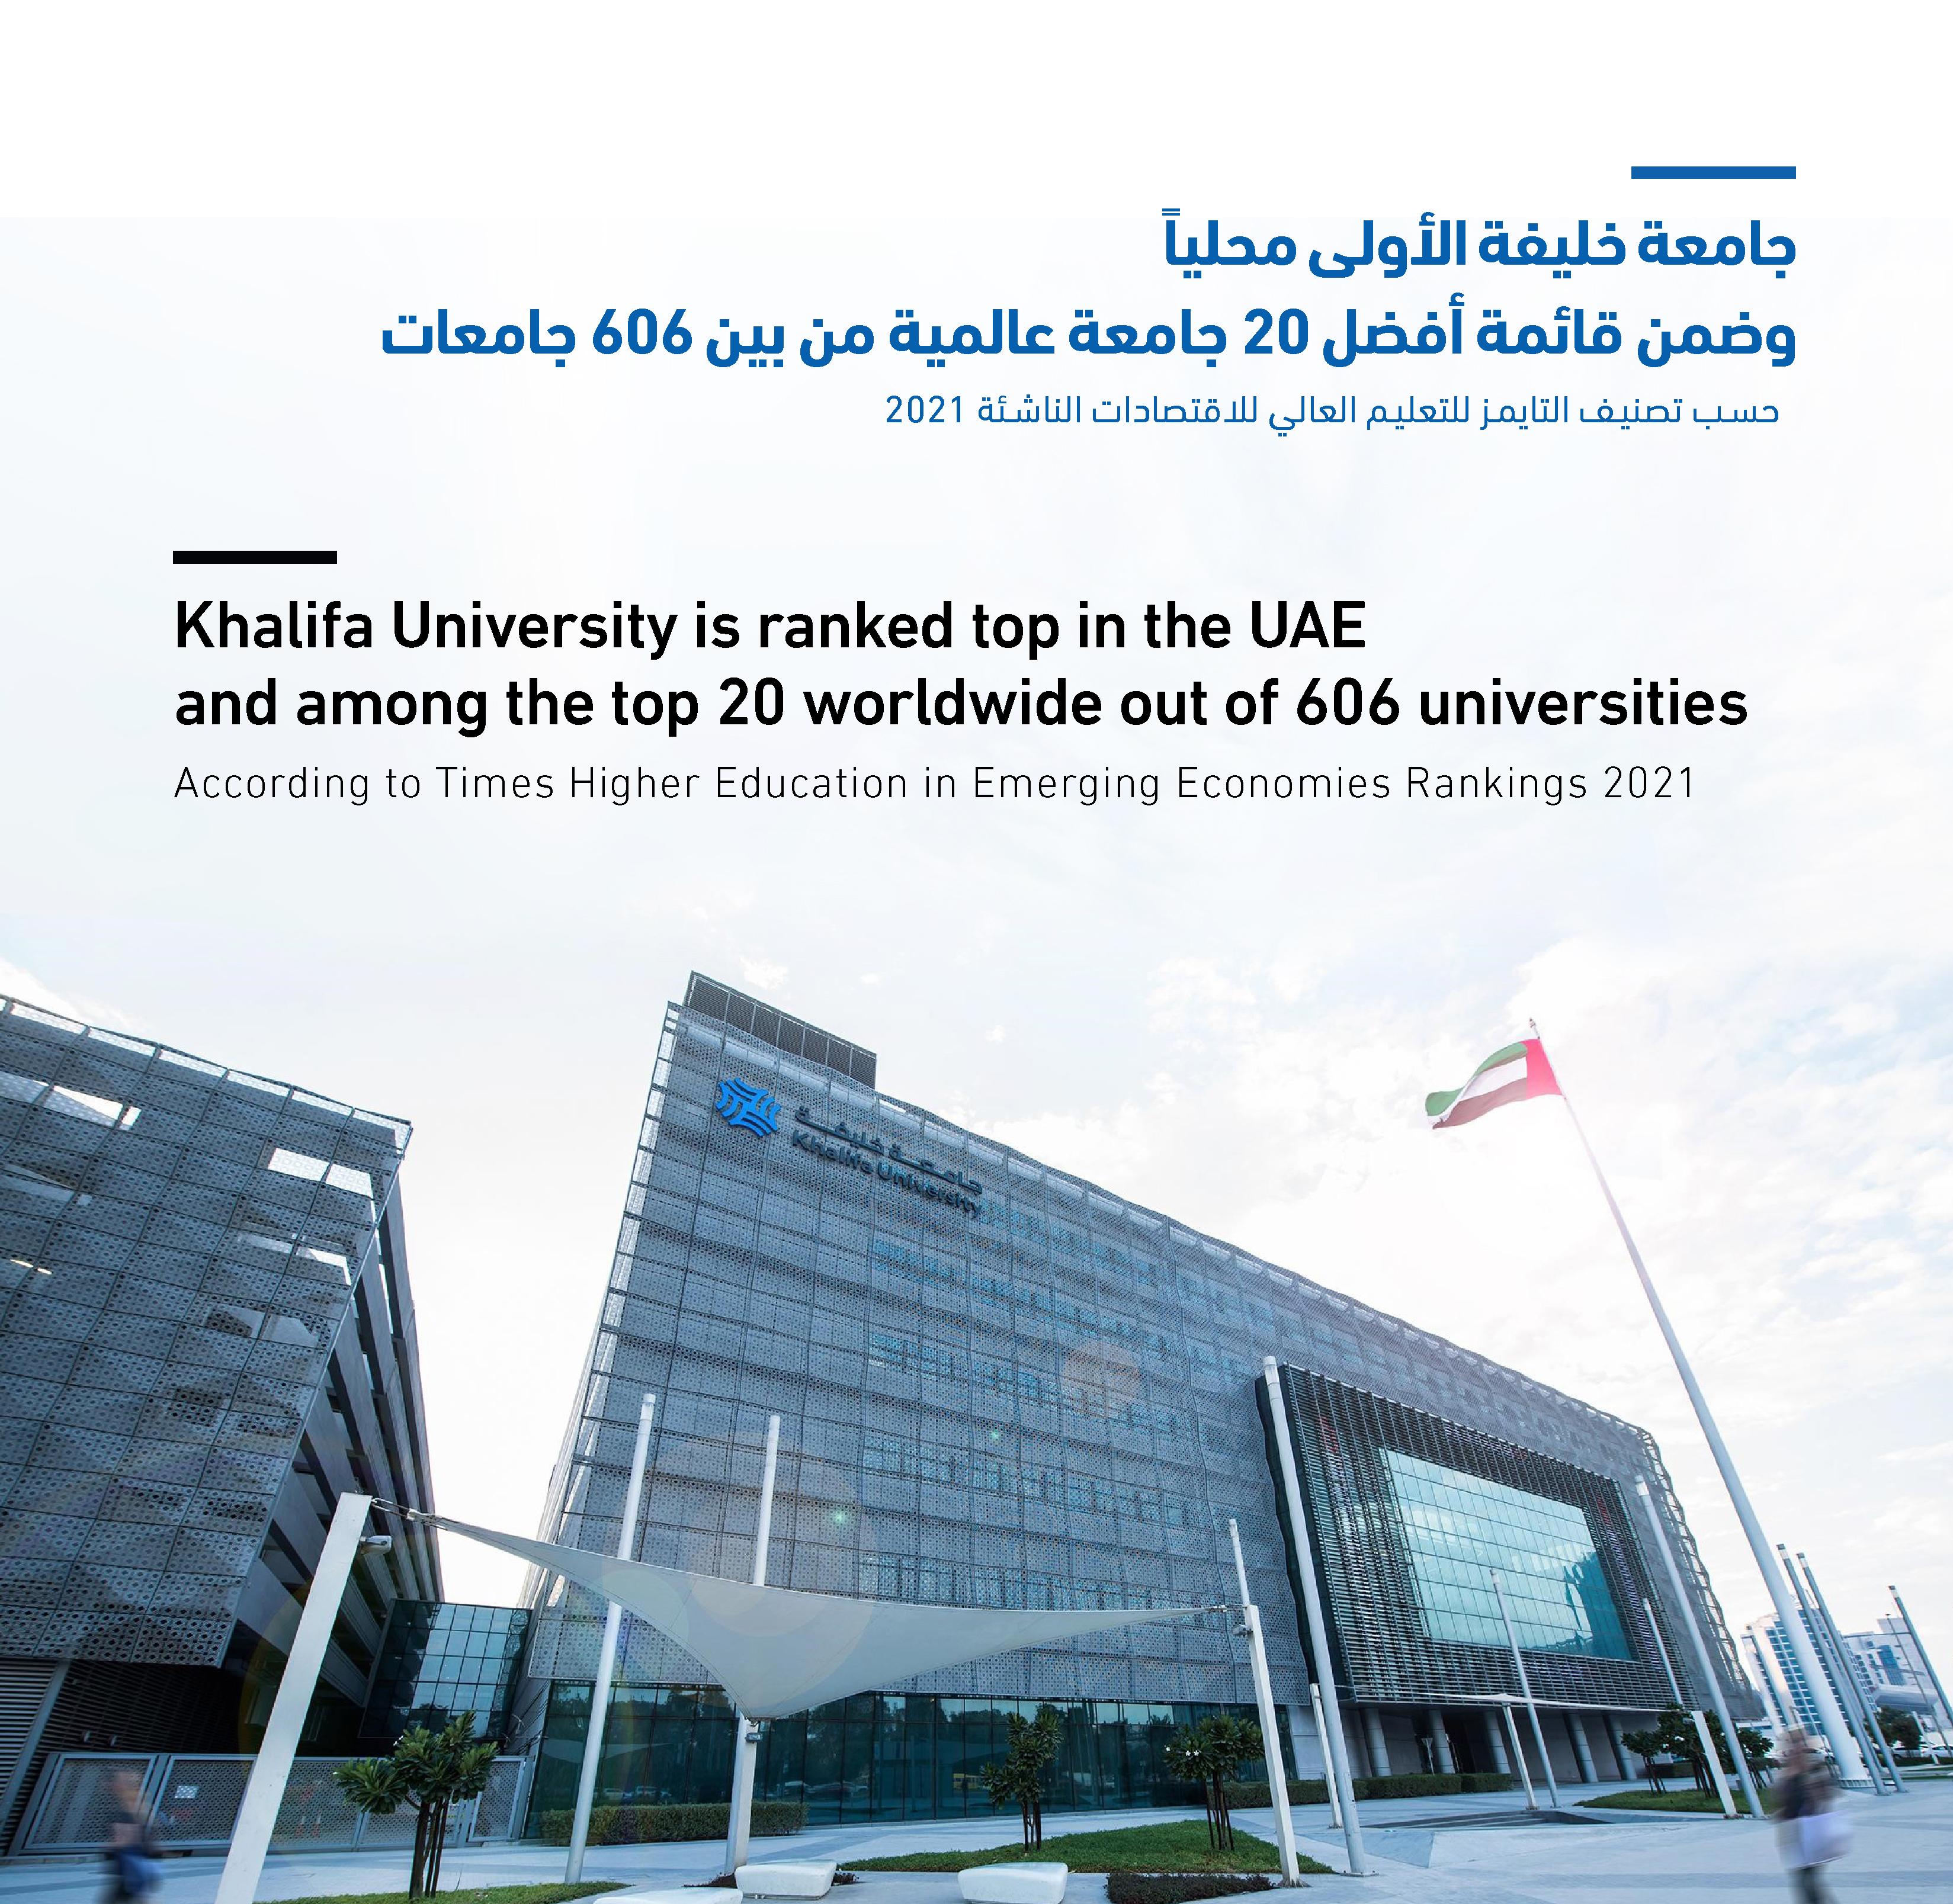 Khalifa University Among Top 20 in THE Emerging Economies Rankings 2021